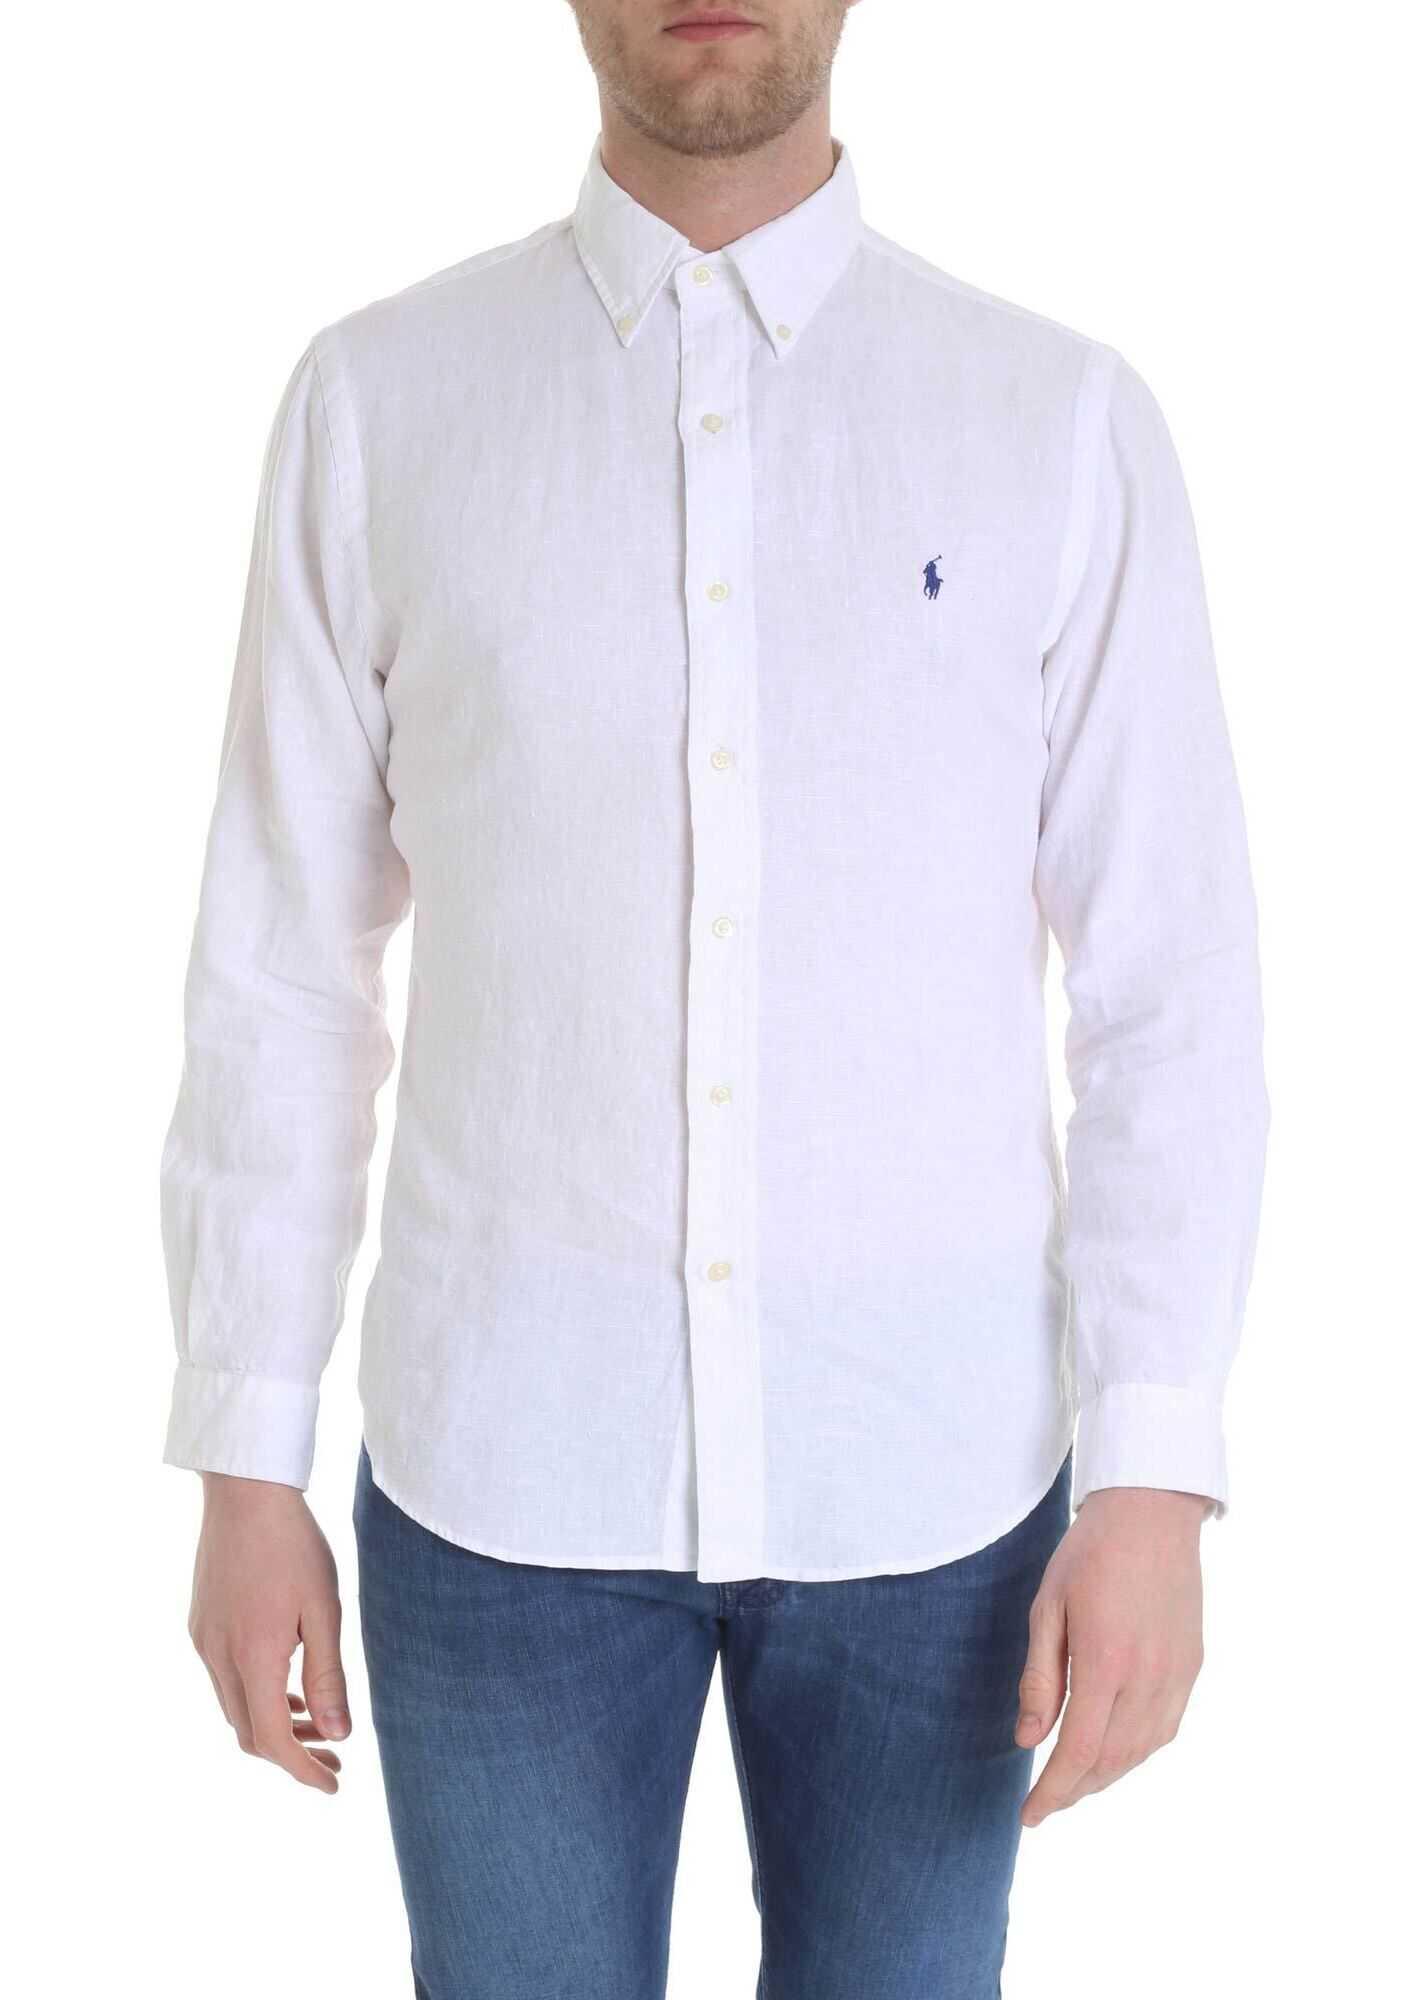 Ralph Lauren White Ralph Lauren Shirt White imagine